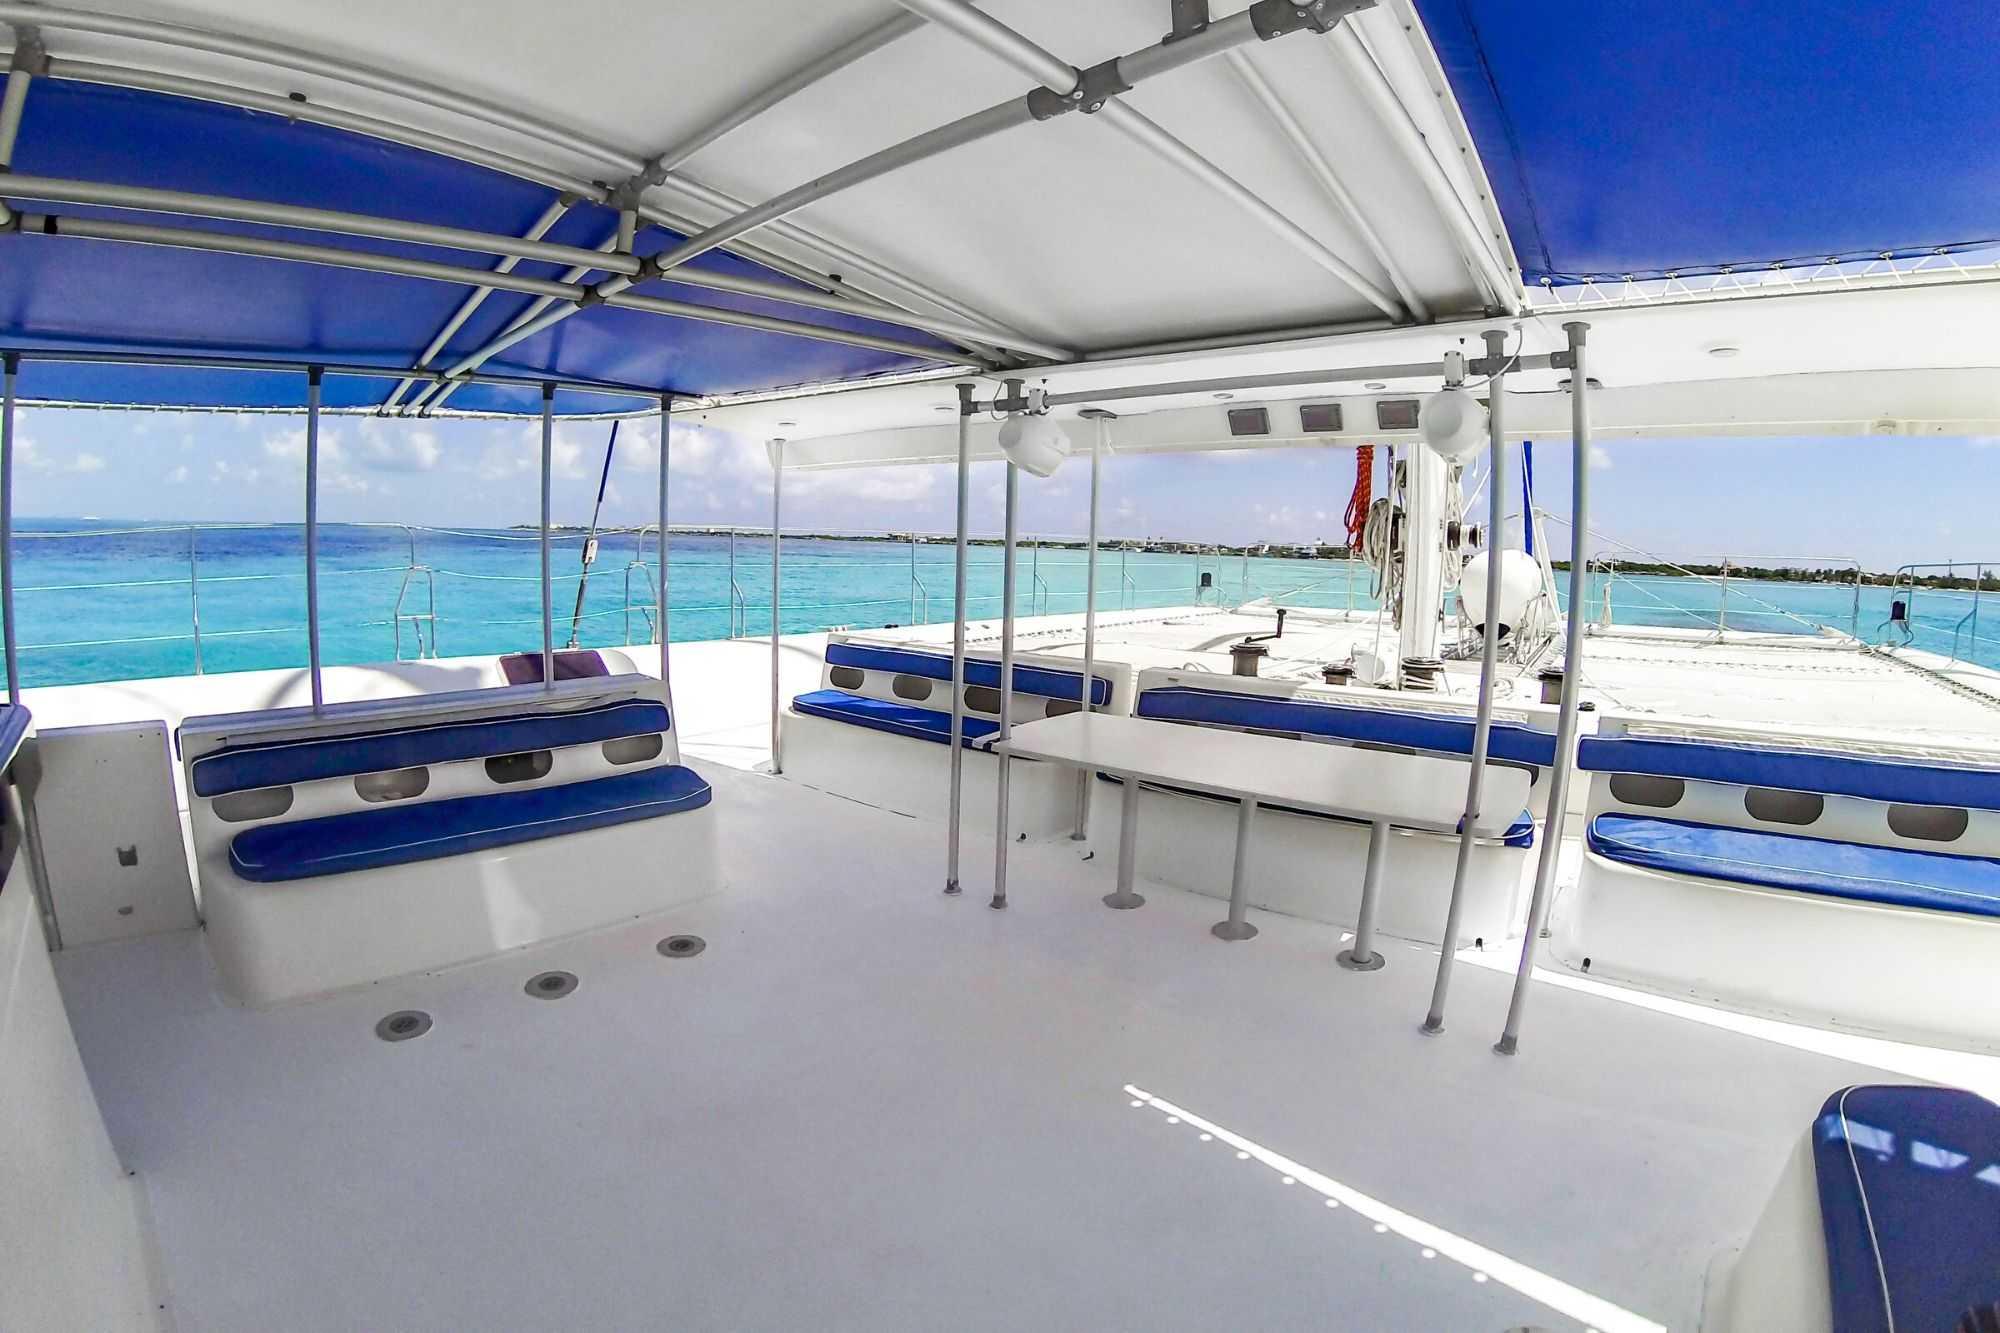 11 Private Isla Mujeres tour in catamaran - Sea Passion I II - Cancun Sailing